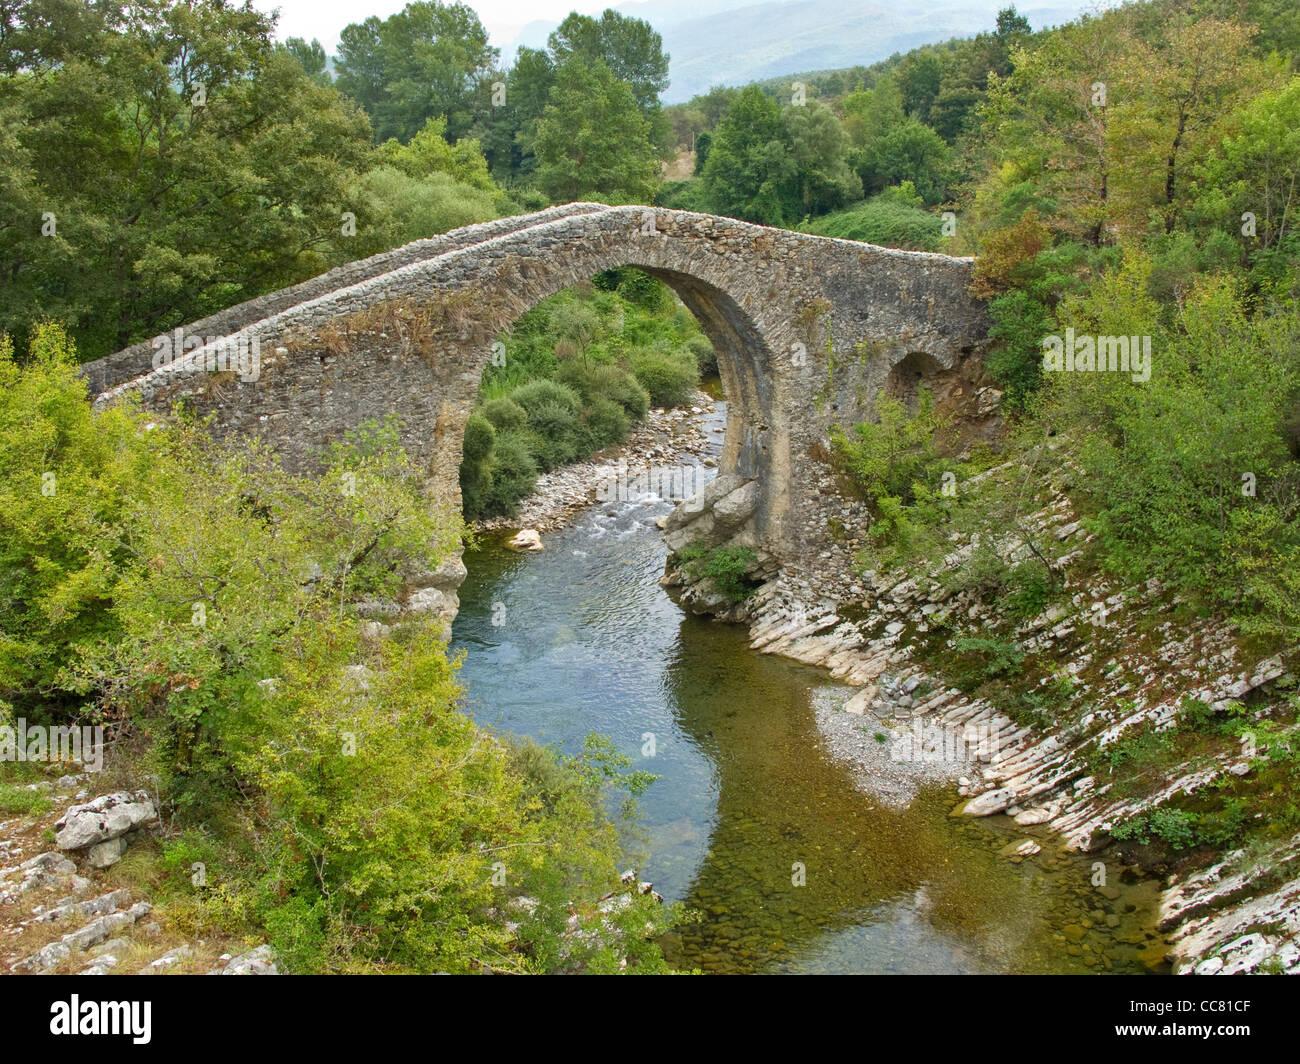 Medieval bridge, Ponte Medievale, on Calore River near Felitto in Cilento National Park, province of Salerno, Campania, Stock Photo